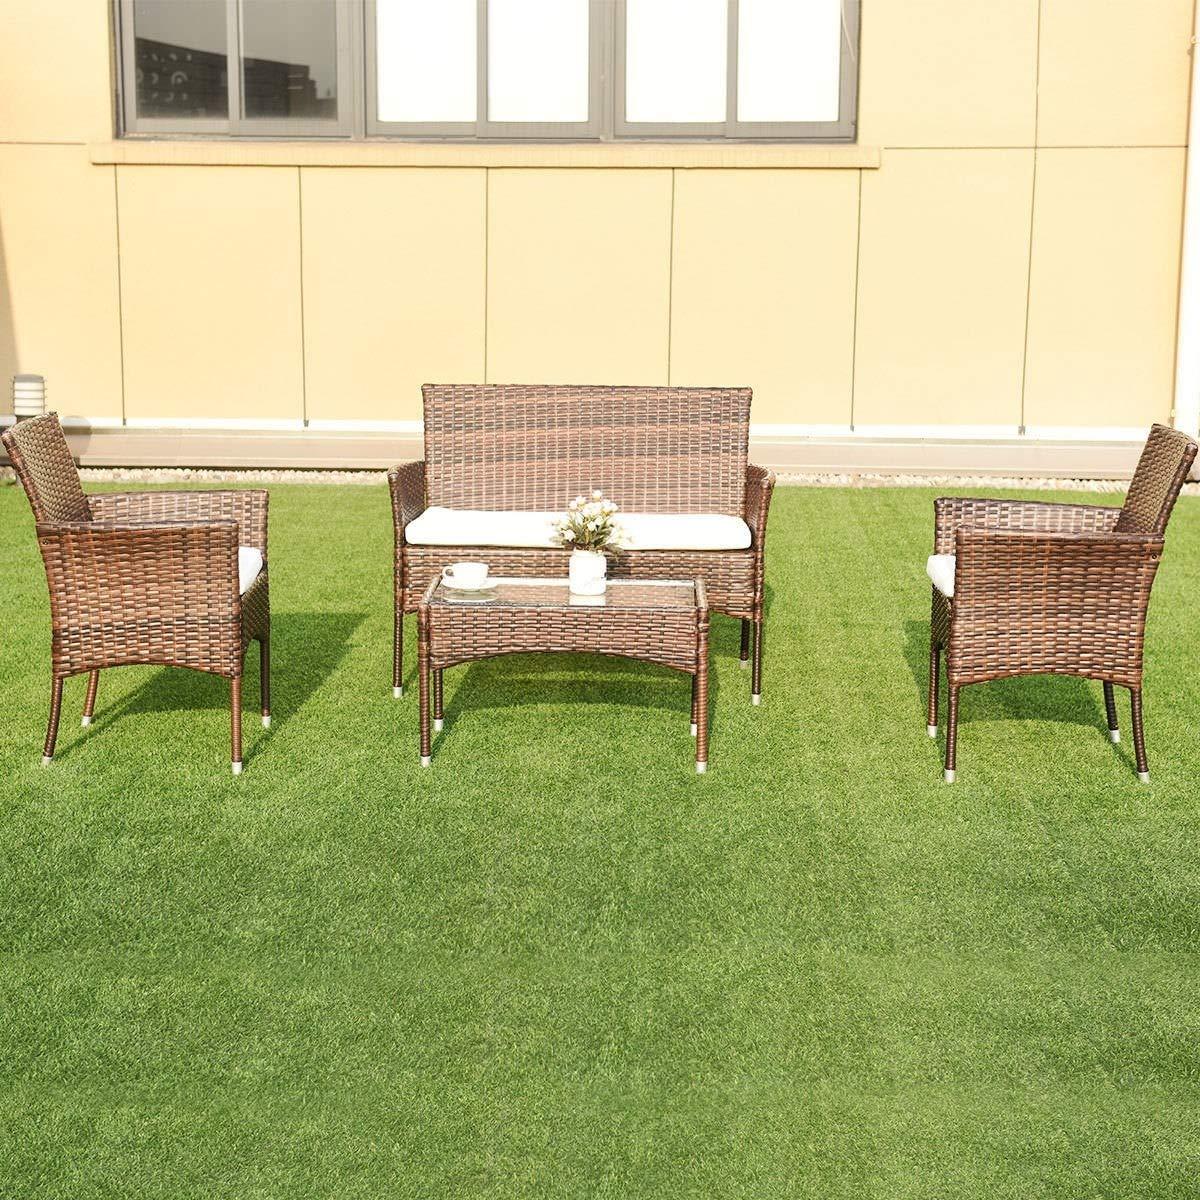 EnjoyShop 4 Pcs PE Rattan Wicker Table Shelf Sofa Furniture Set with Cushion Dining Garden Picnic Outdoor by EnjoyShop (Image #7)